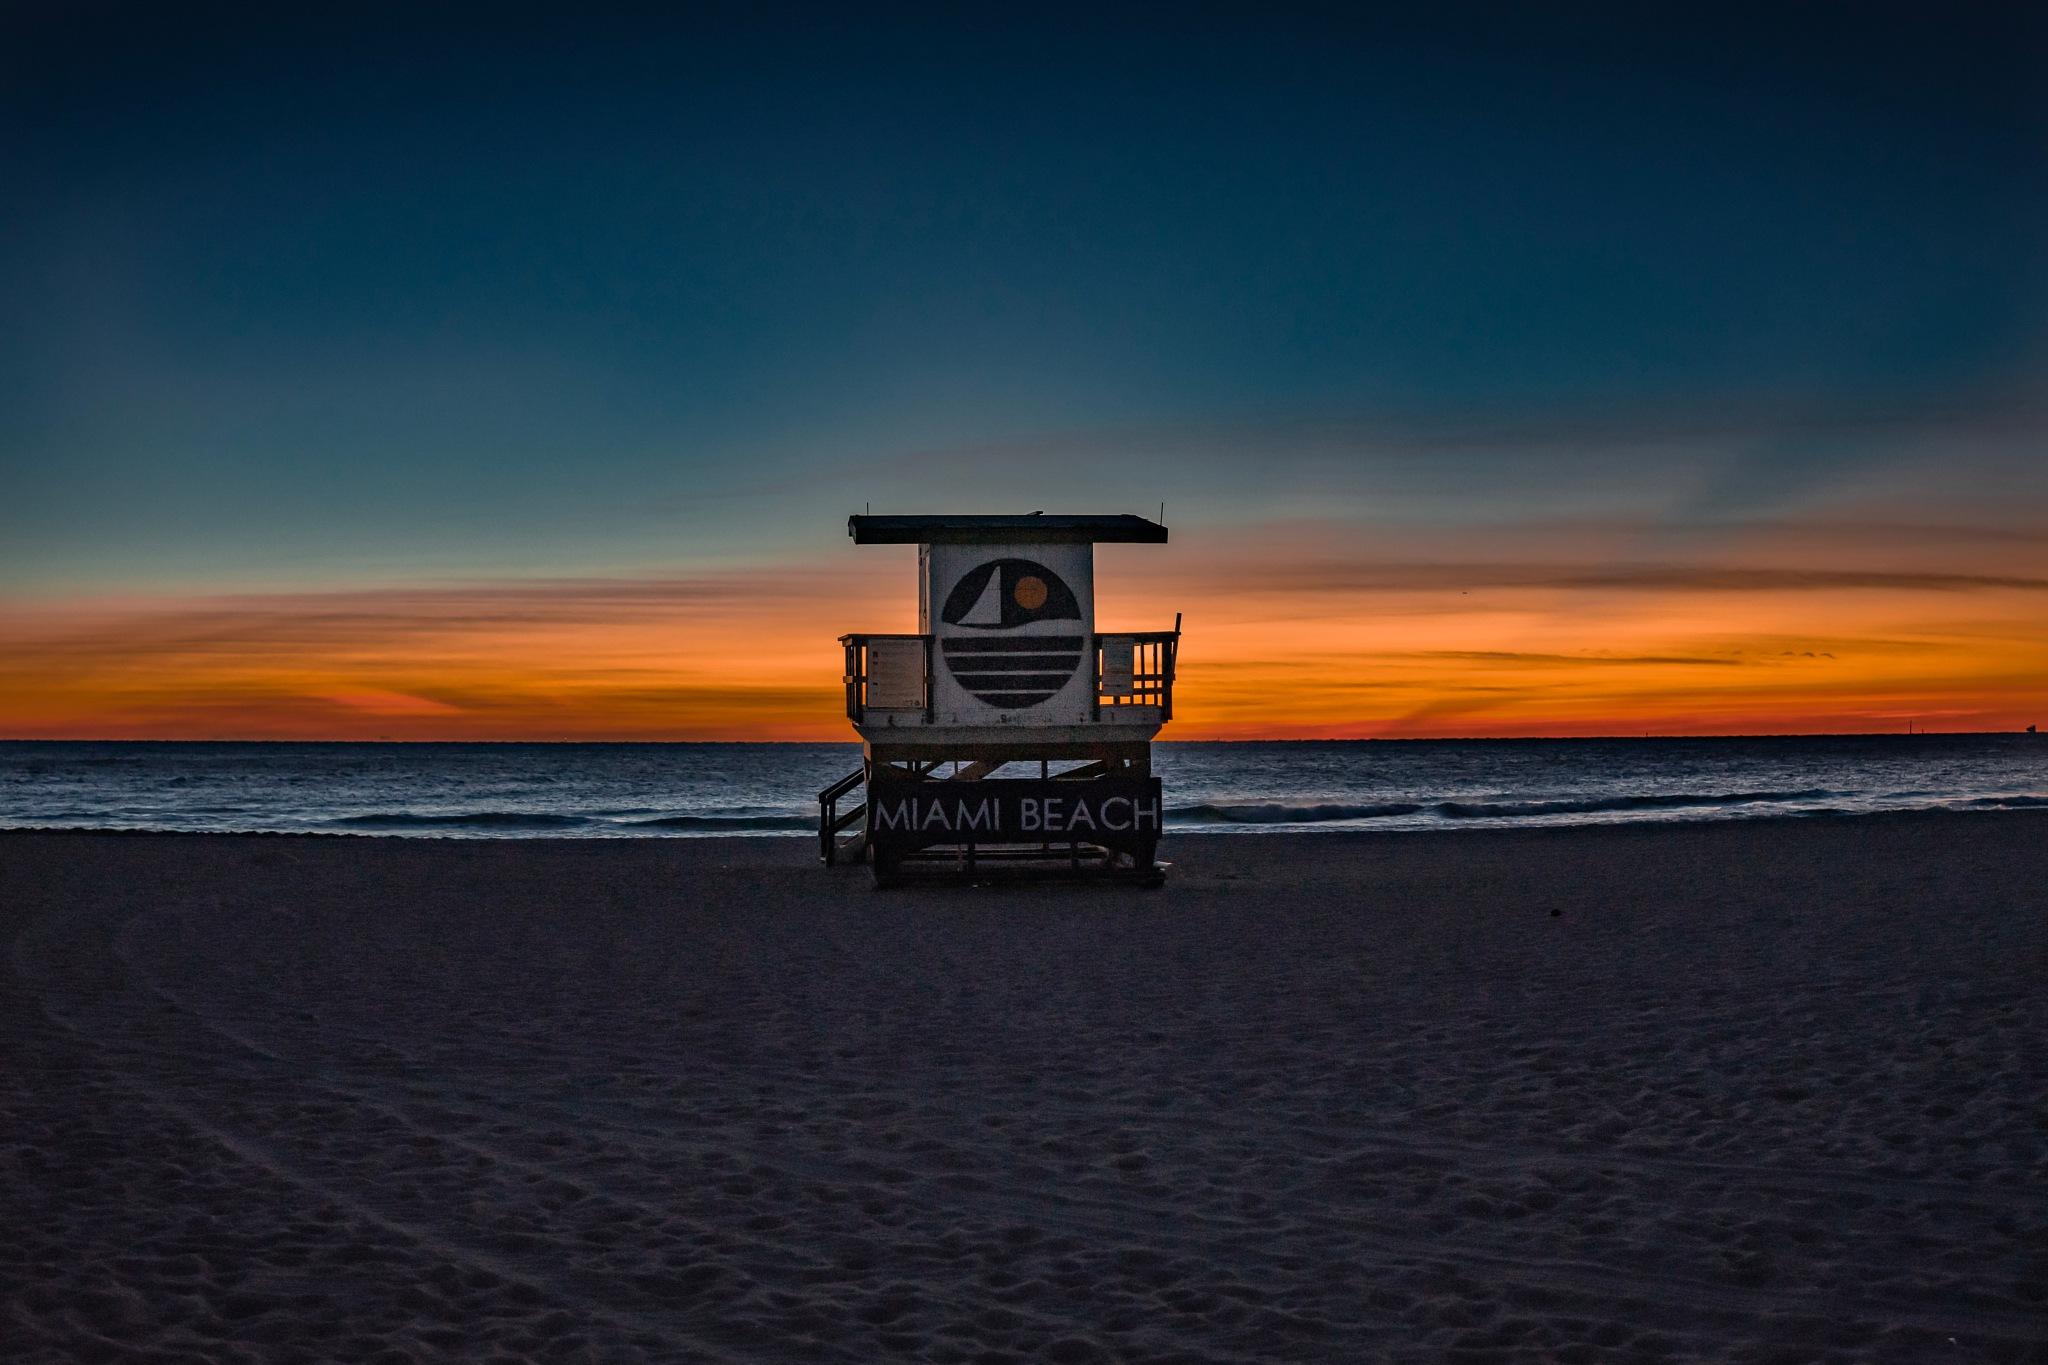 Miami by Emil Kolbeck